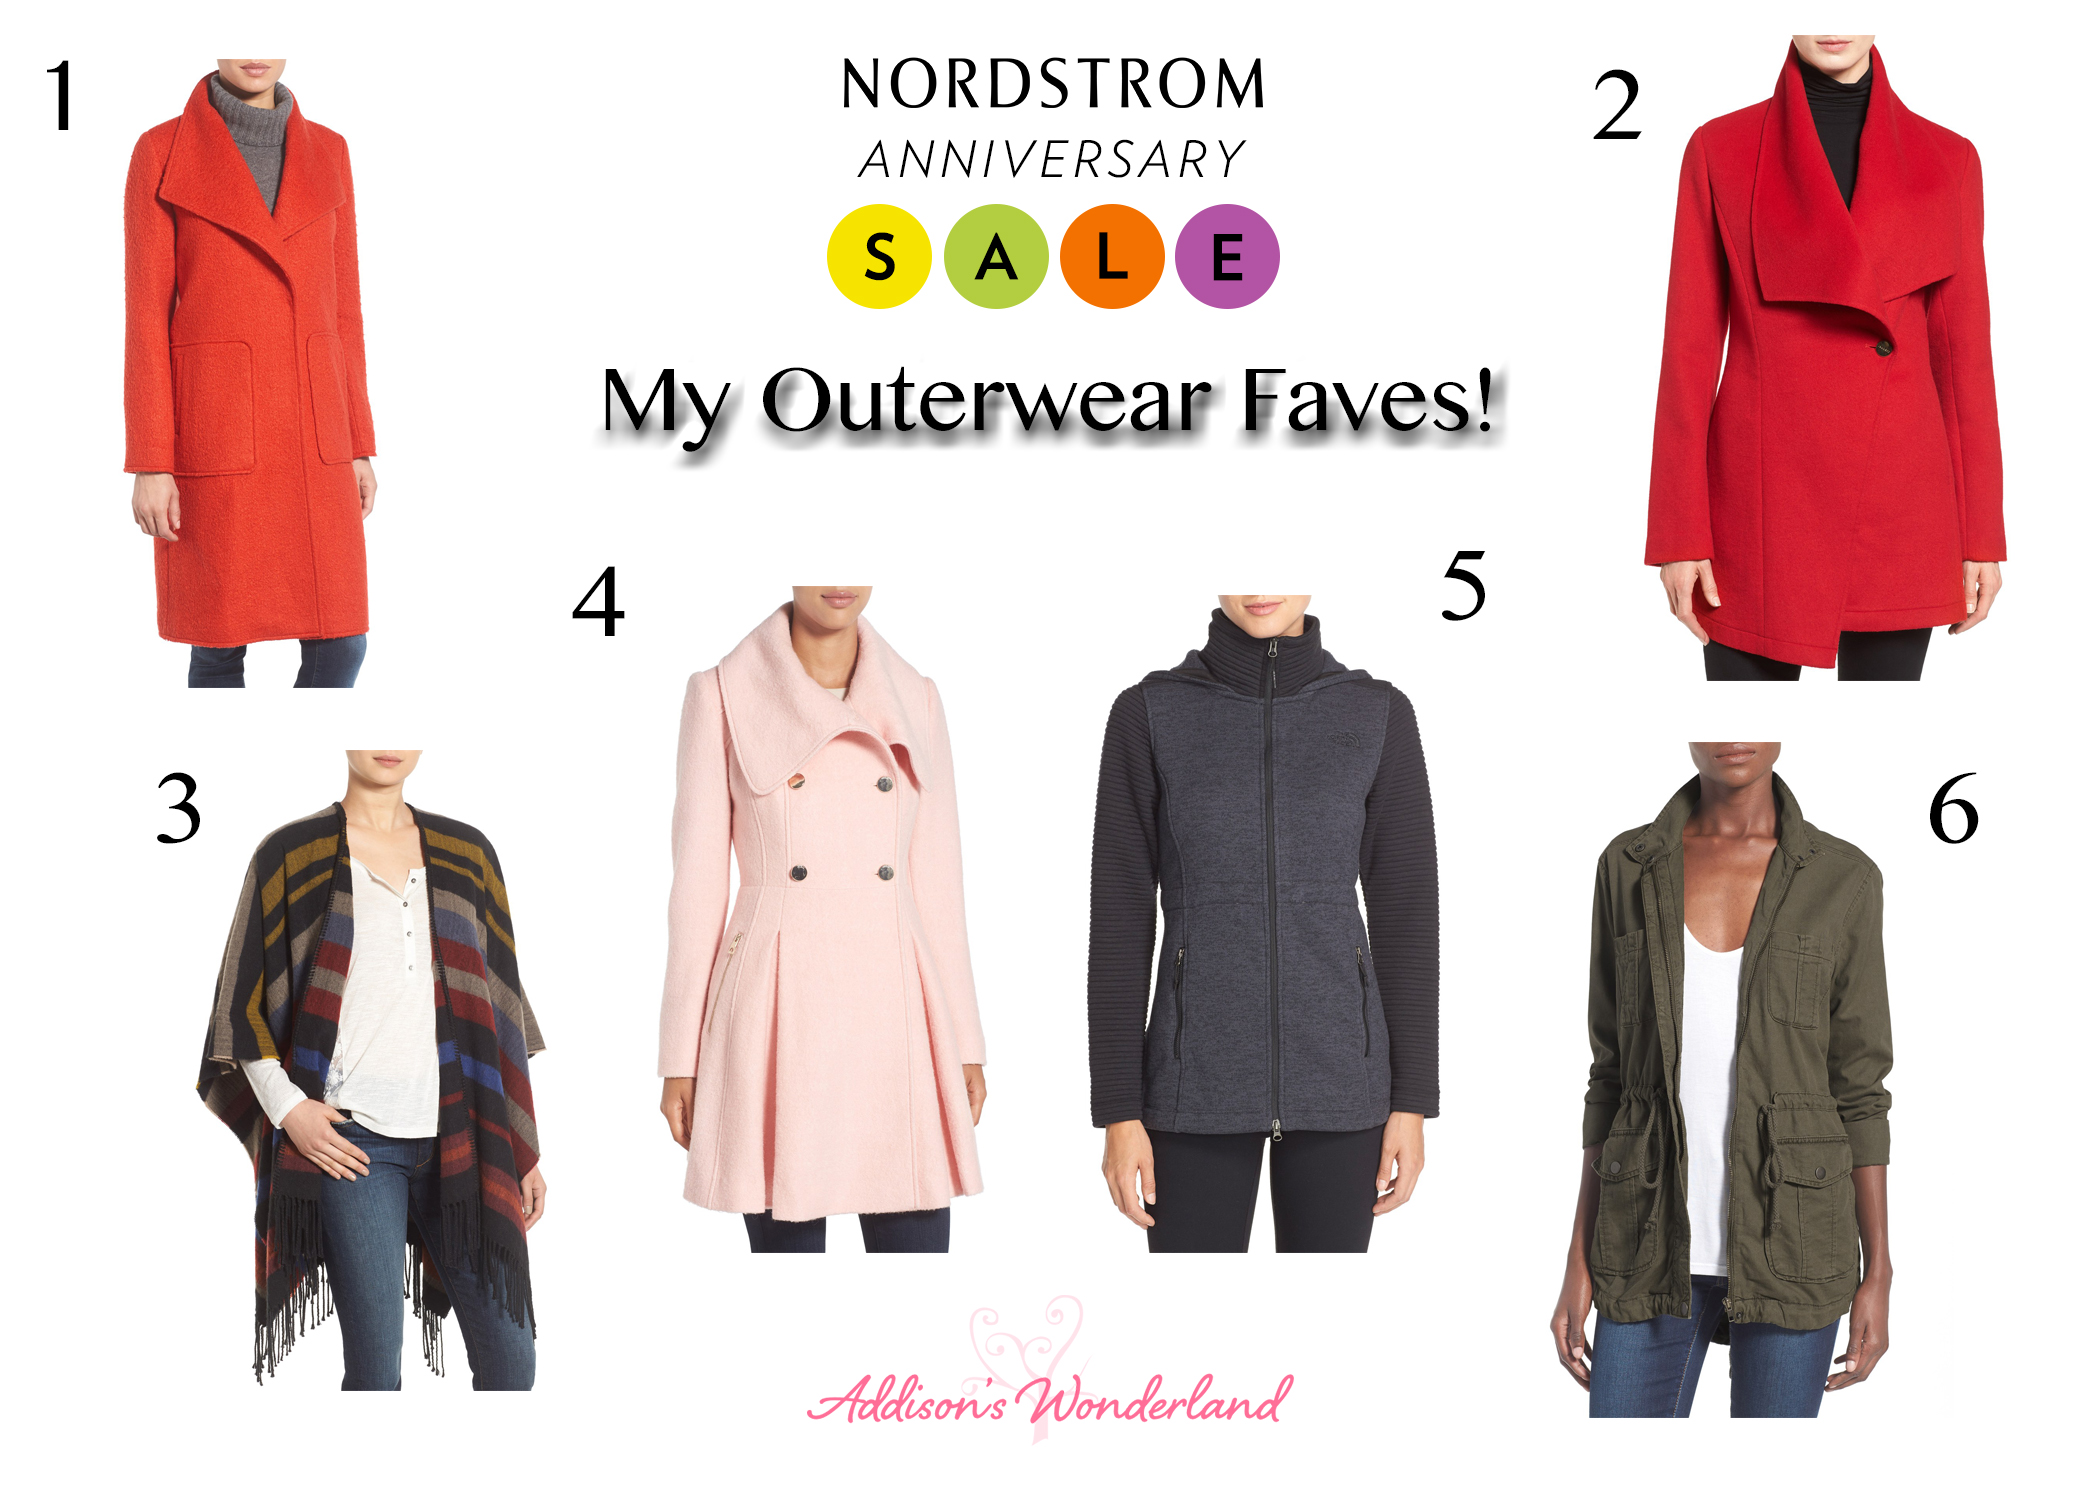 Nordstrom Anniversary Sale Outerwear